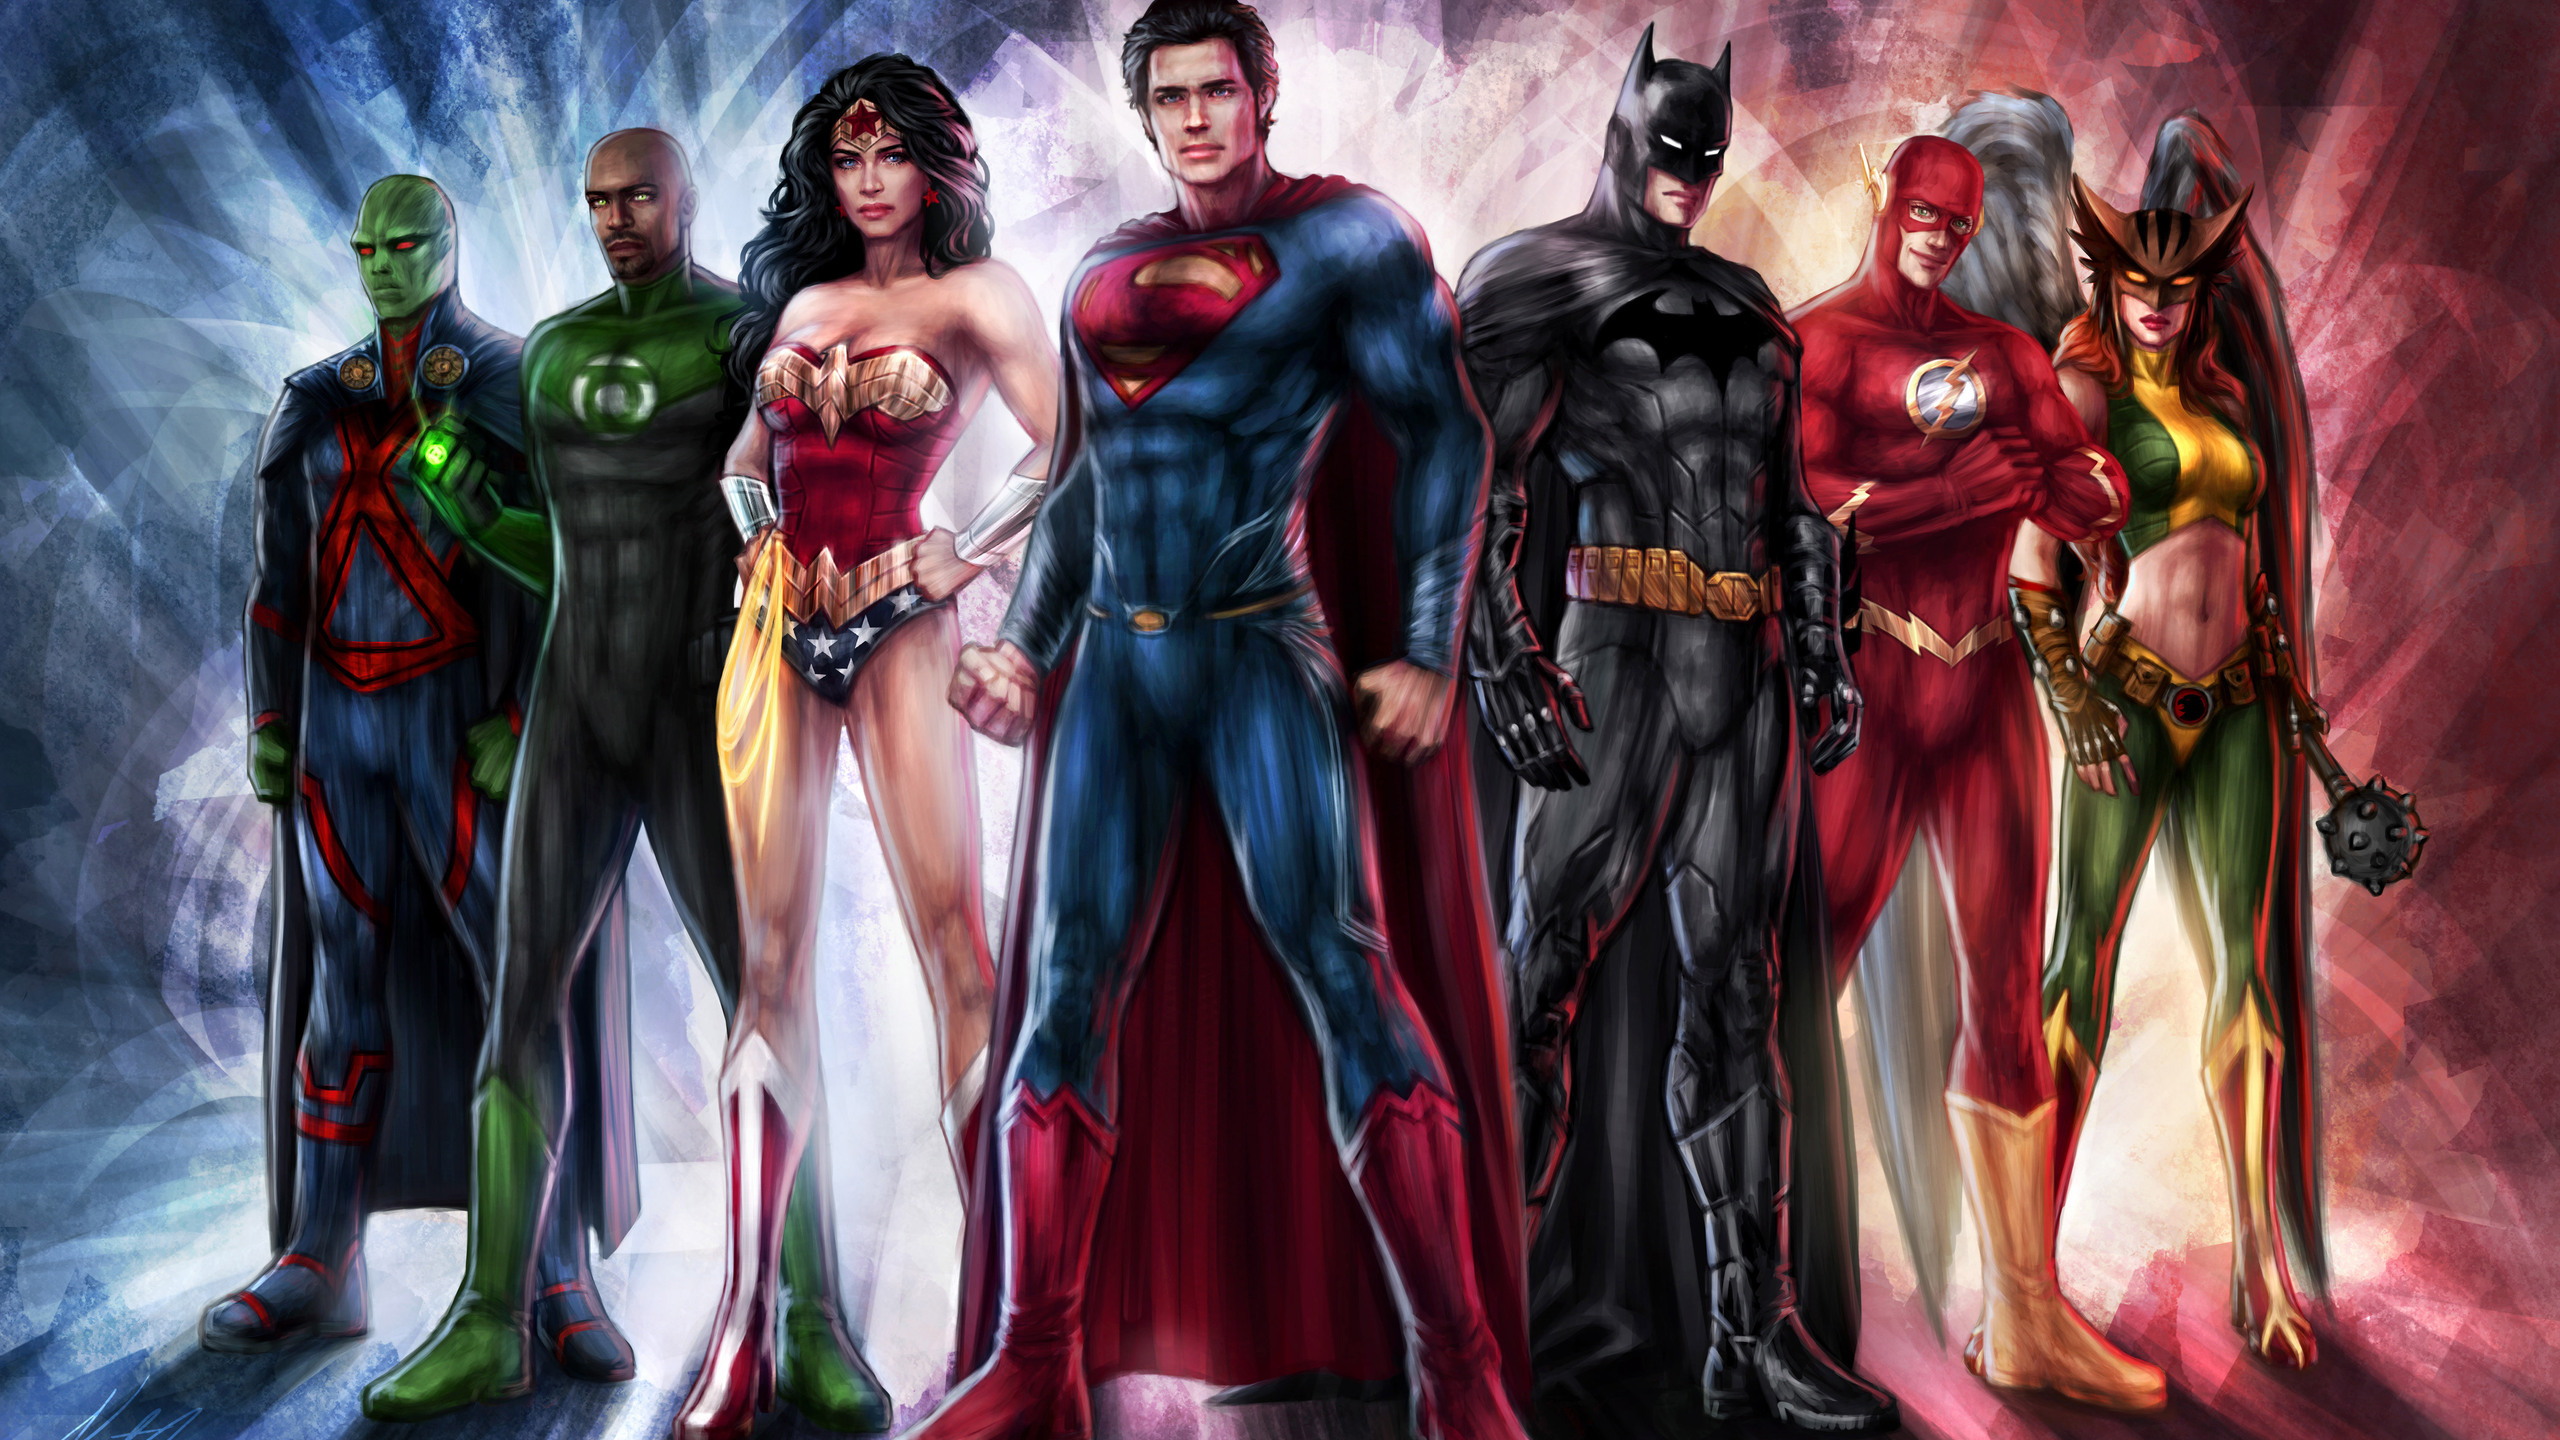 2560x1440 Justice League Art 5k 1440P Resolution HD 4k ...